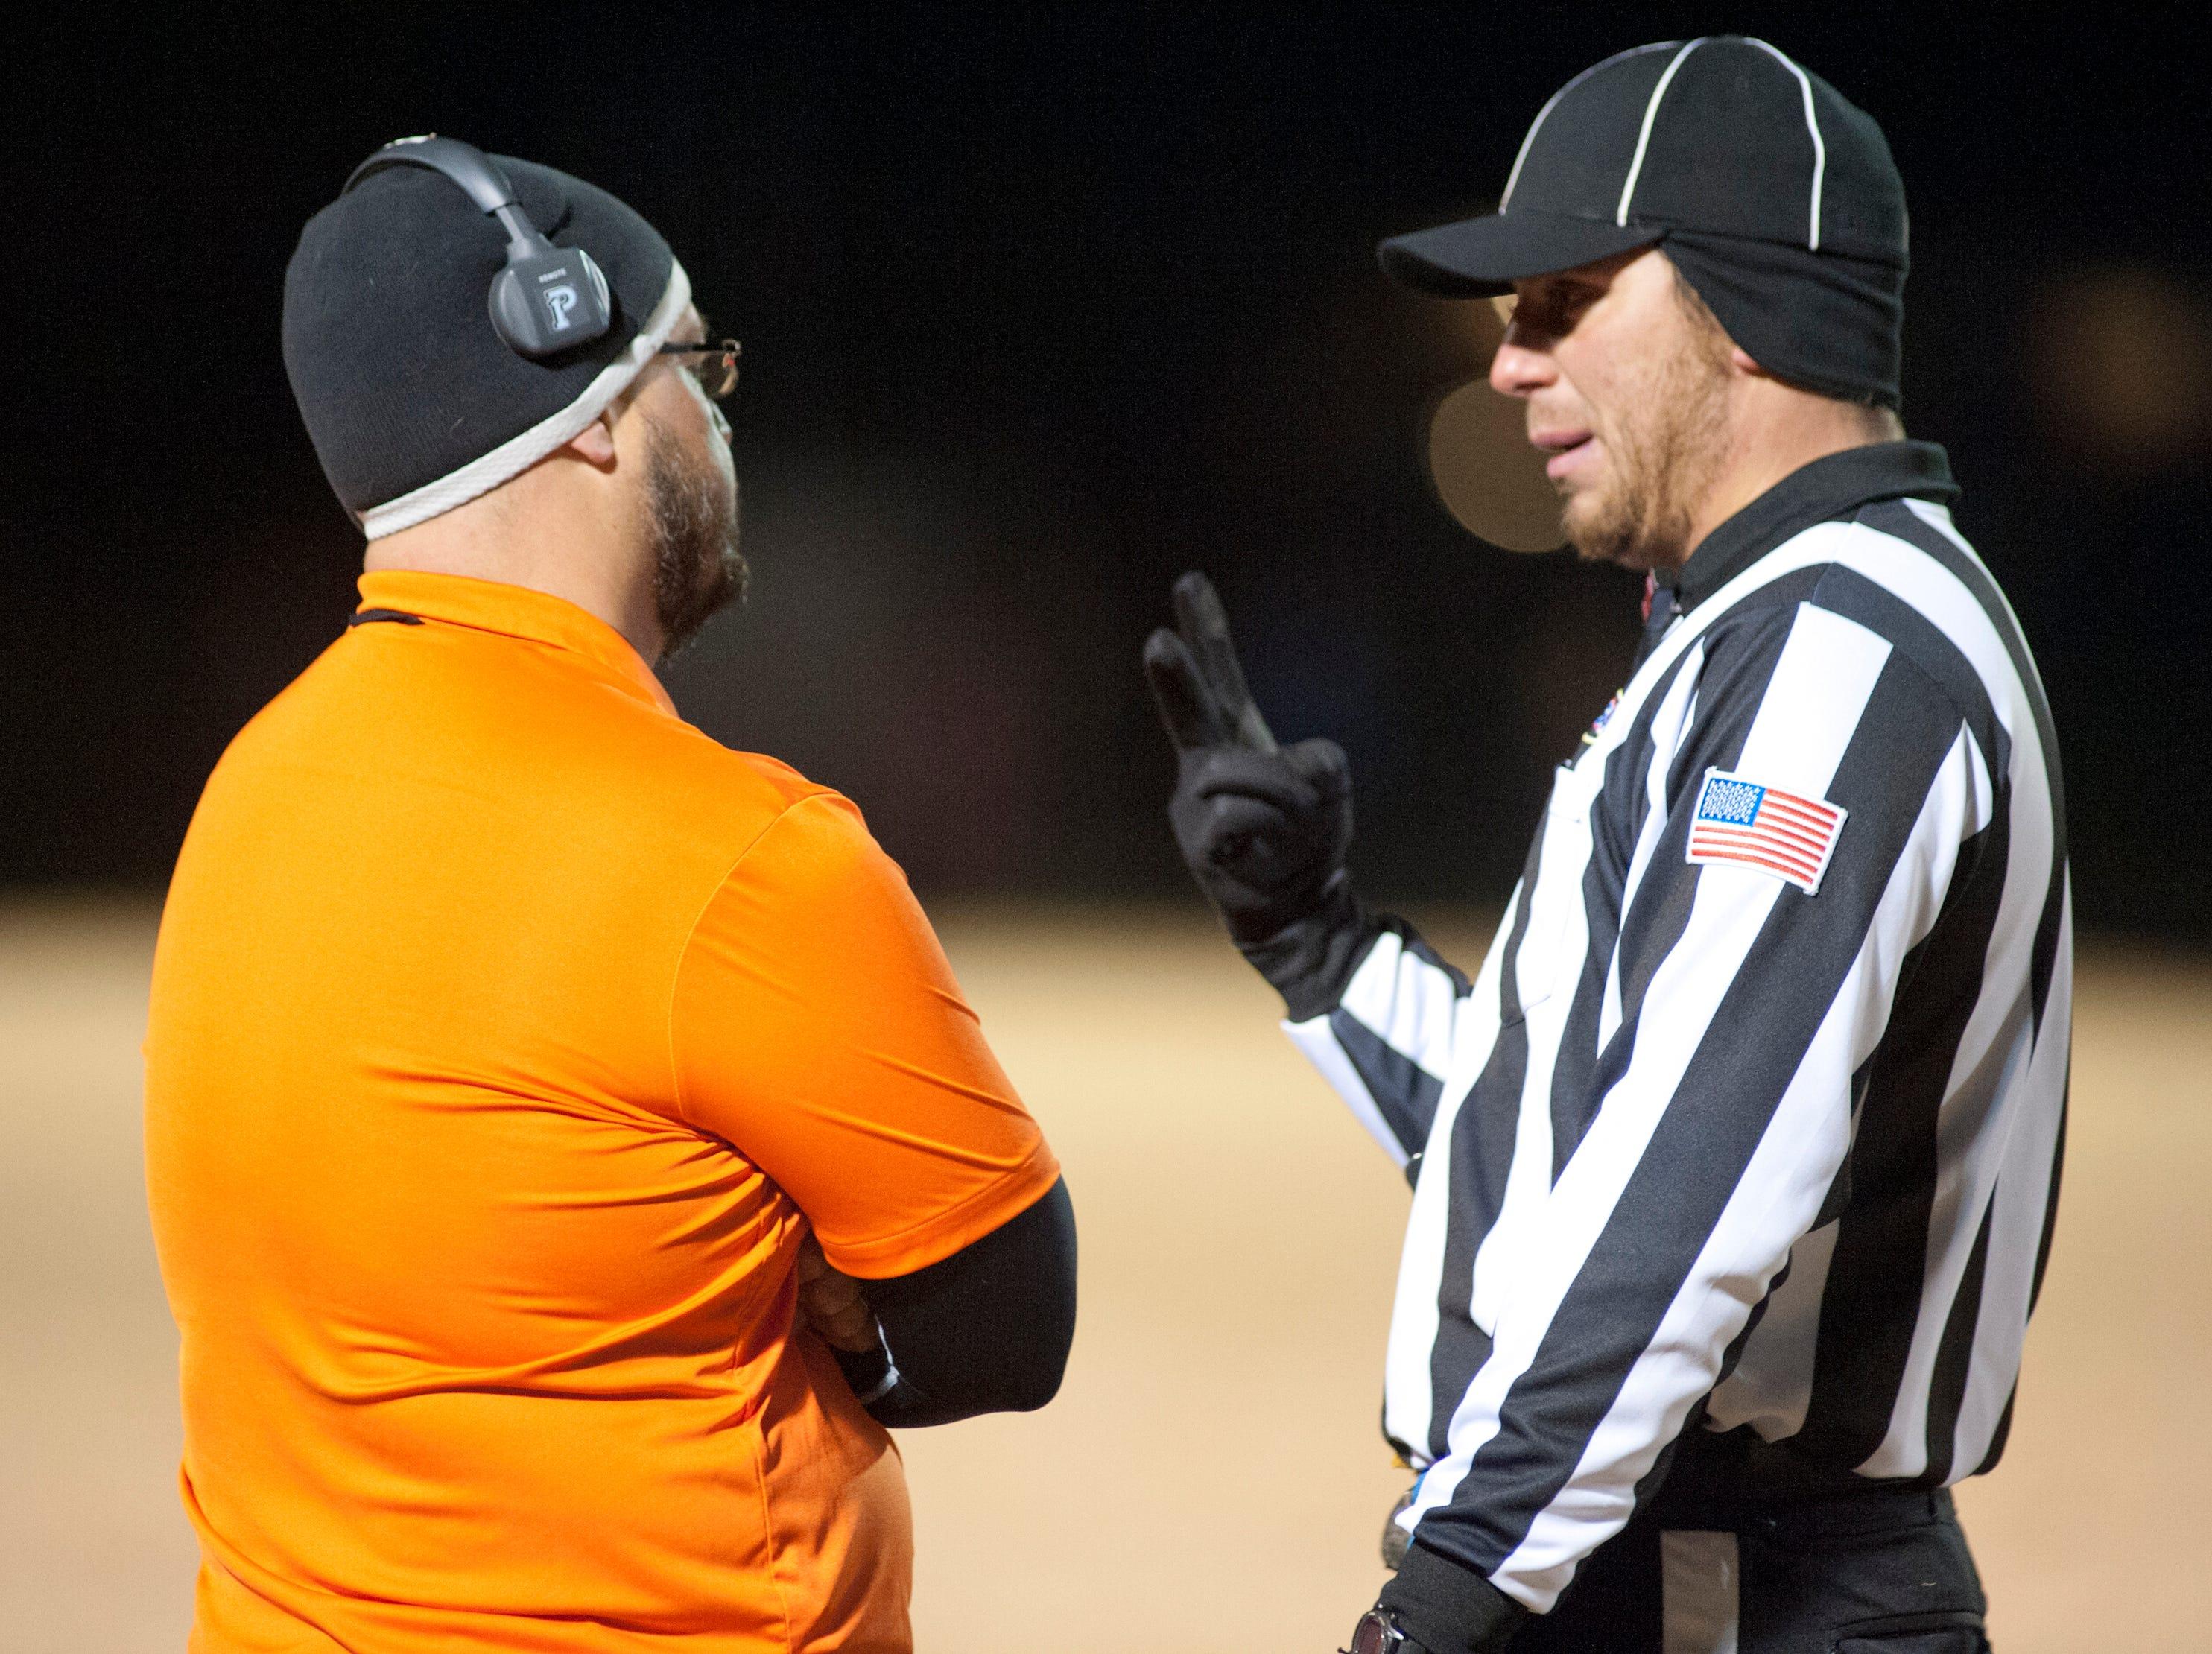 The referee explains a foul on each team to Fern Creek head football coach Joshua Abell. Nov. 9, 2018